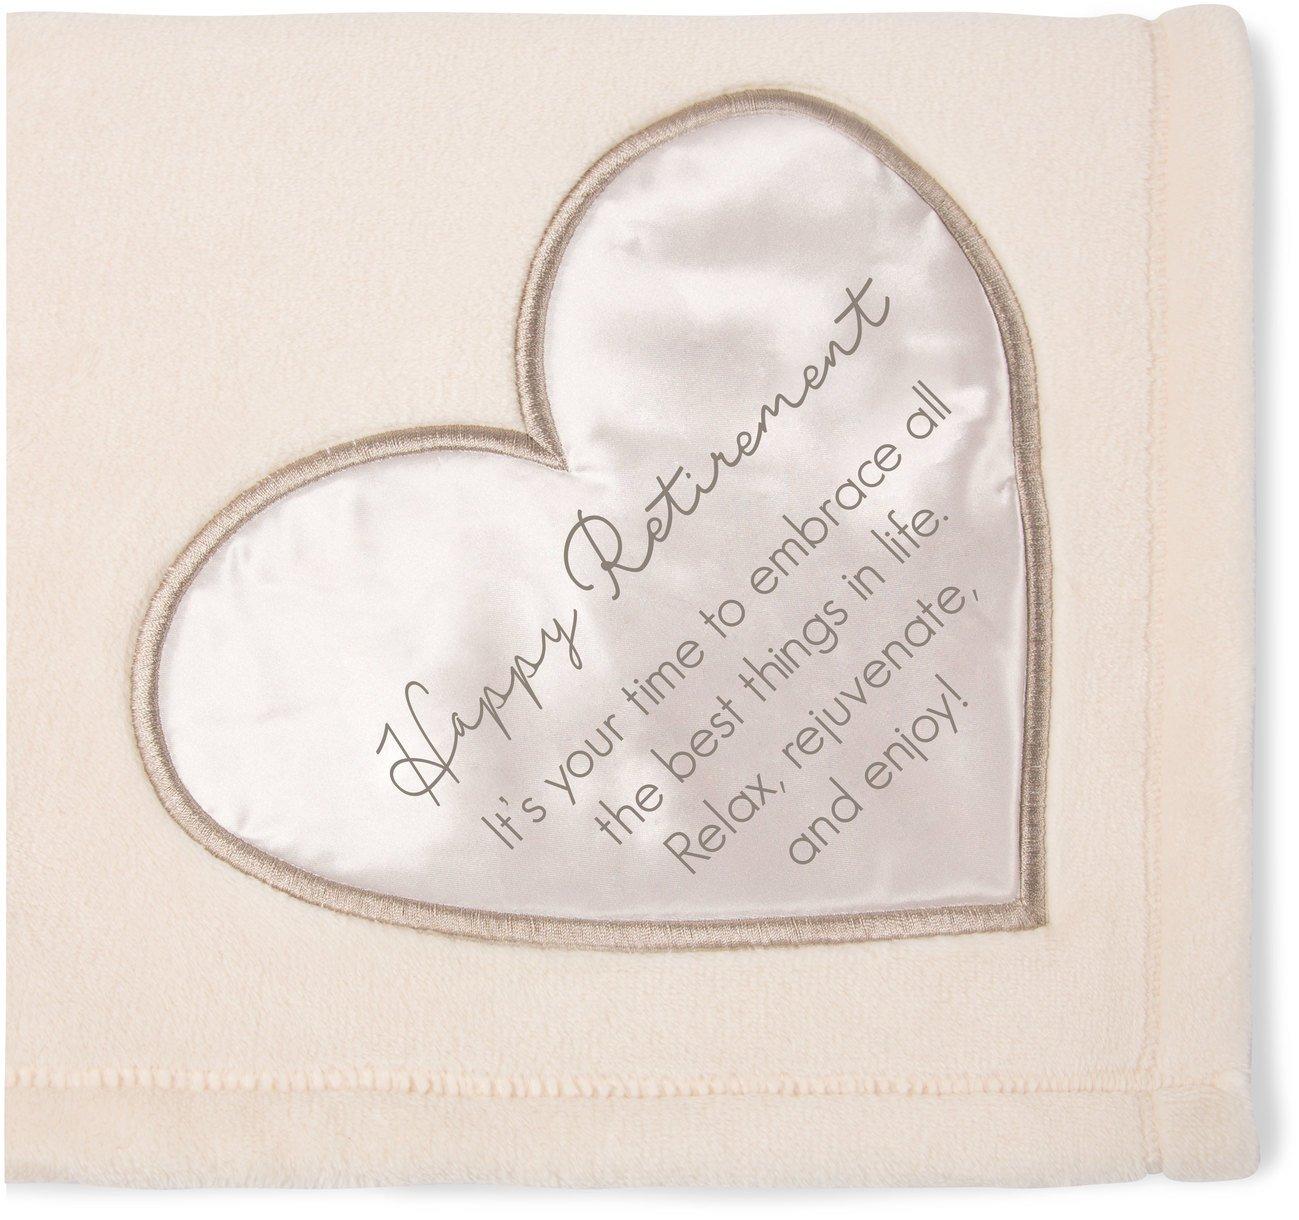 The Comfort Blanket Soft Blanket Happy Retirement Warm Royal Plush Throw